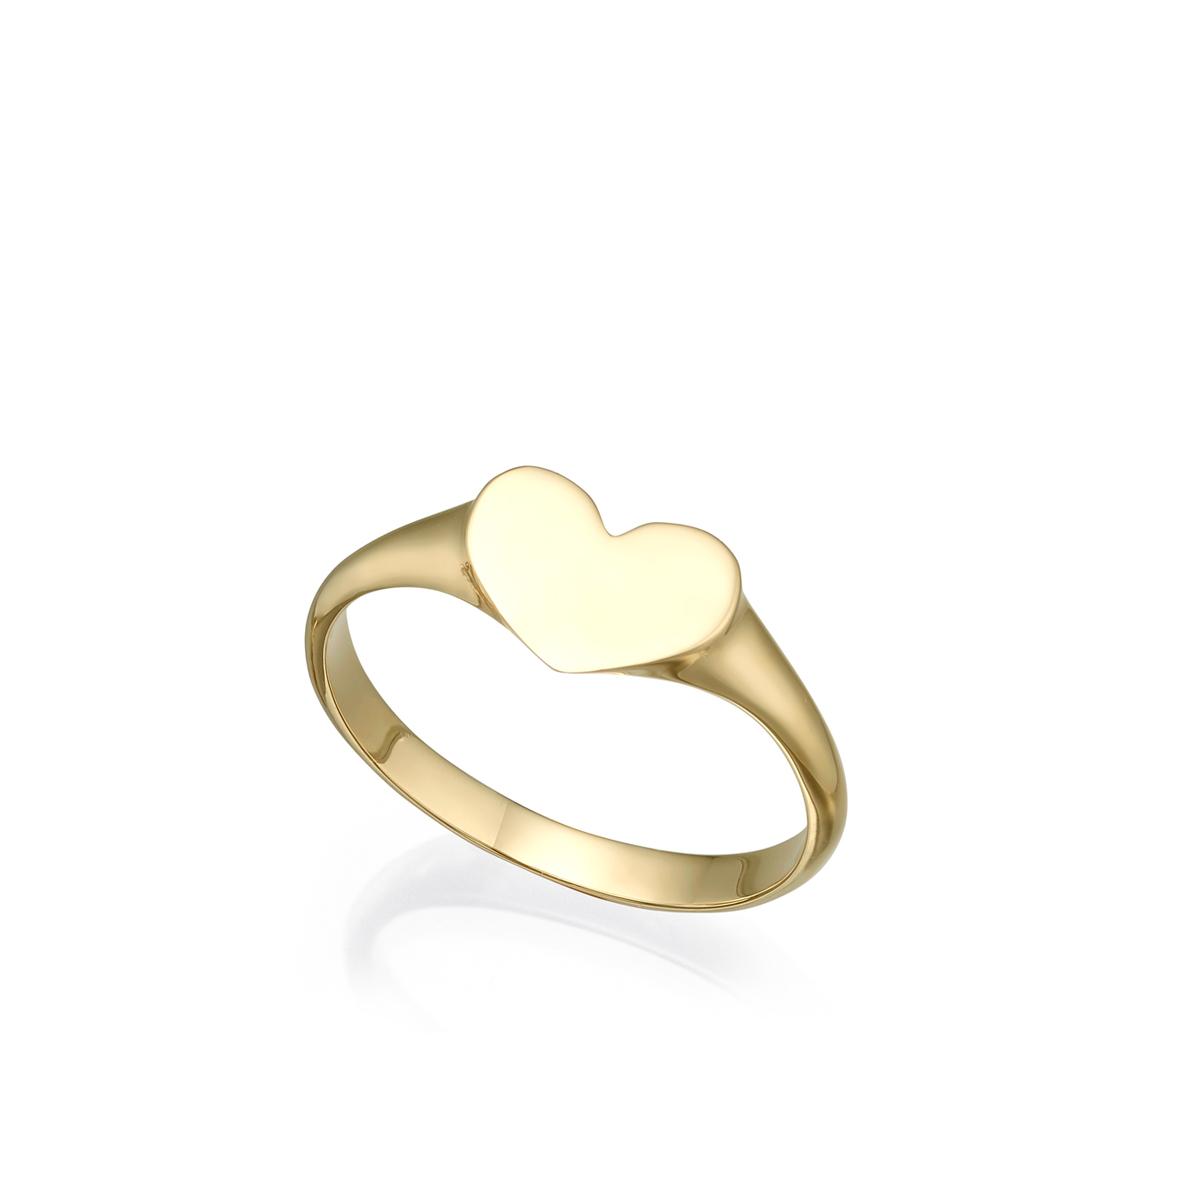 Heart signet gold ring